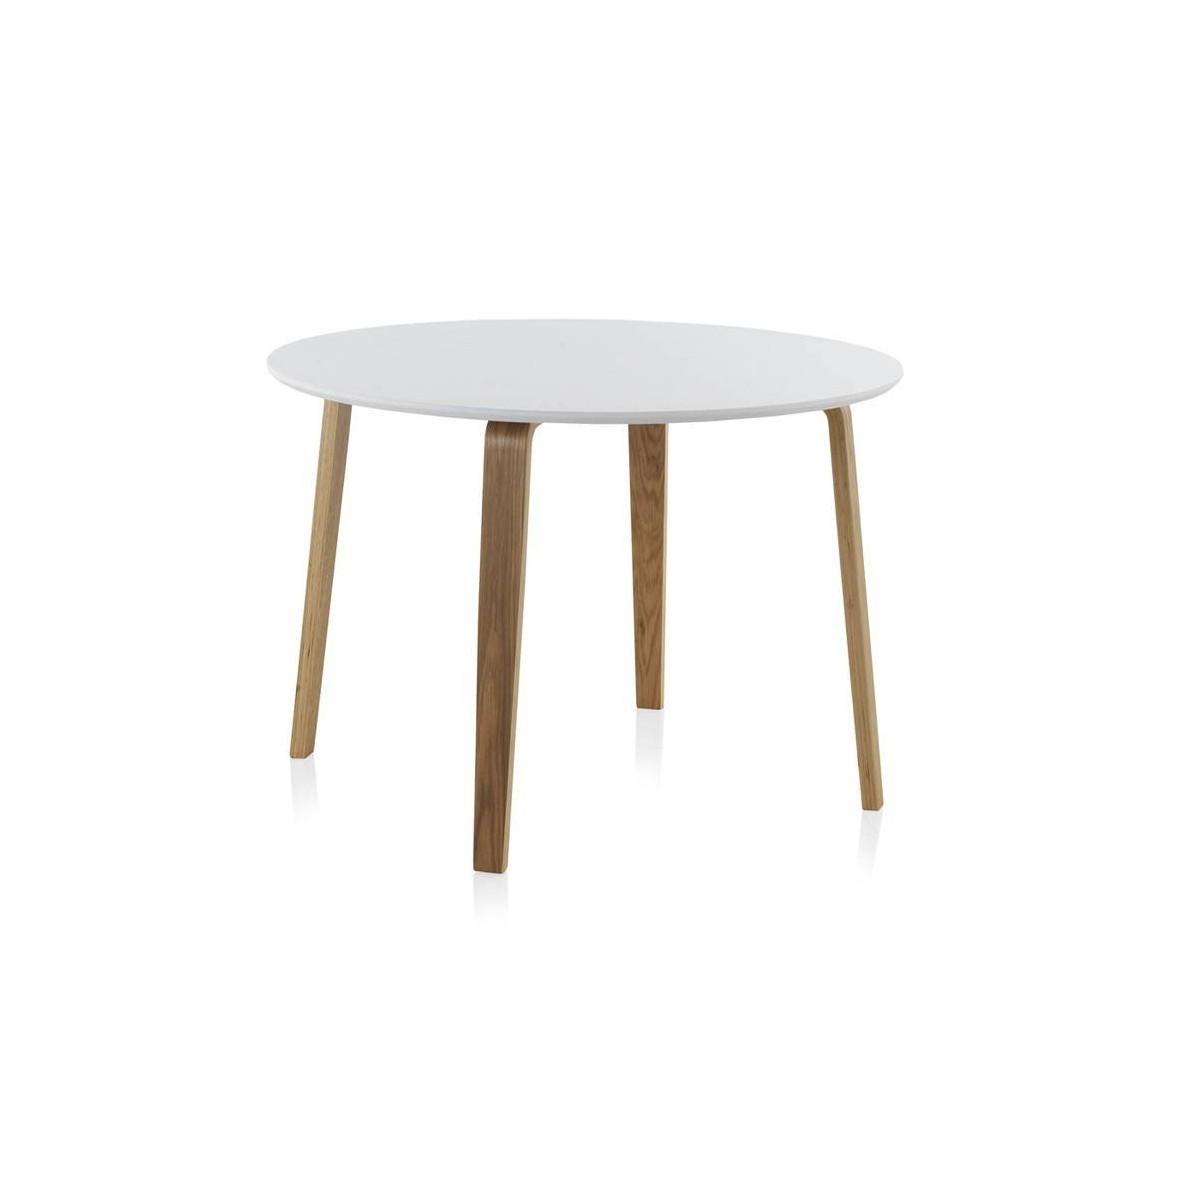 Mesa redonda comedor madera haya finland modelo 1 blanca for Mesa comedor haya